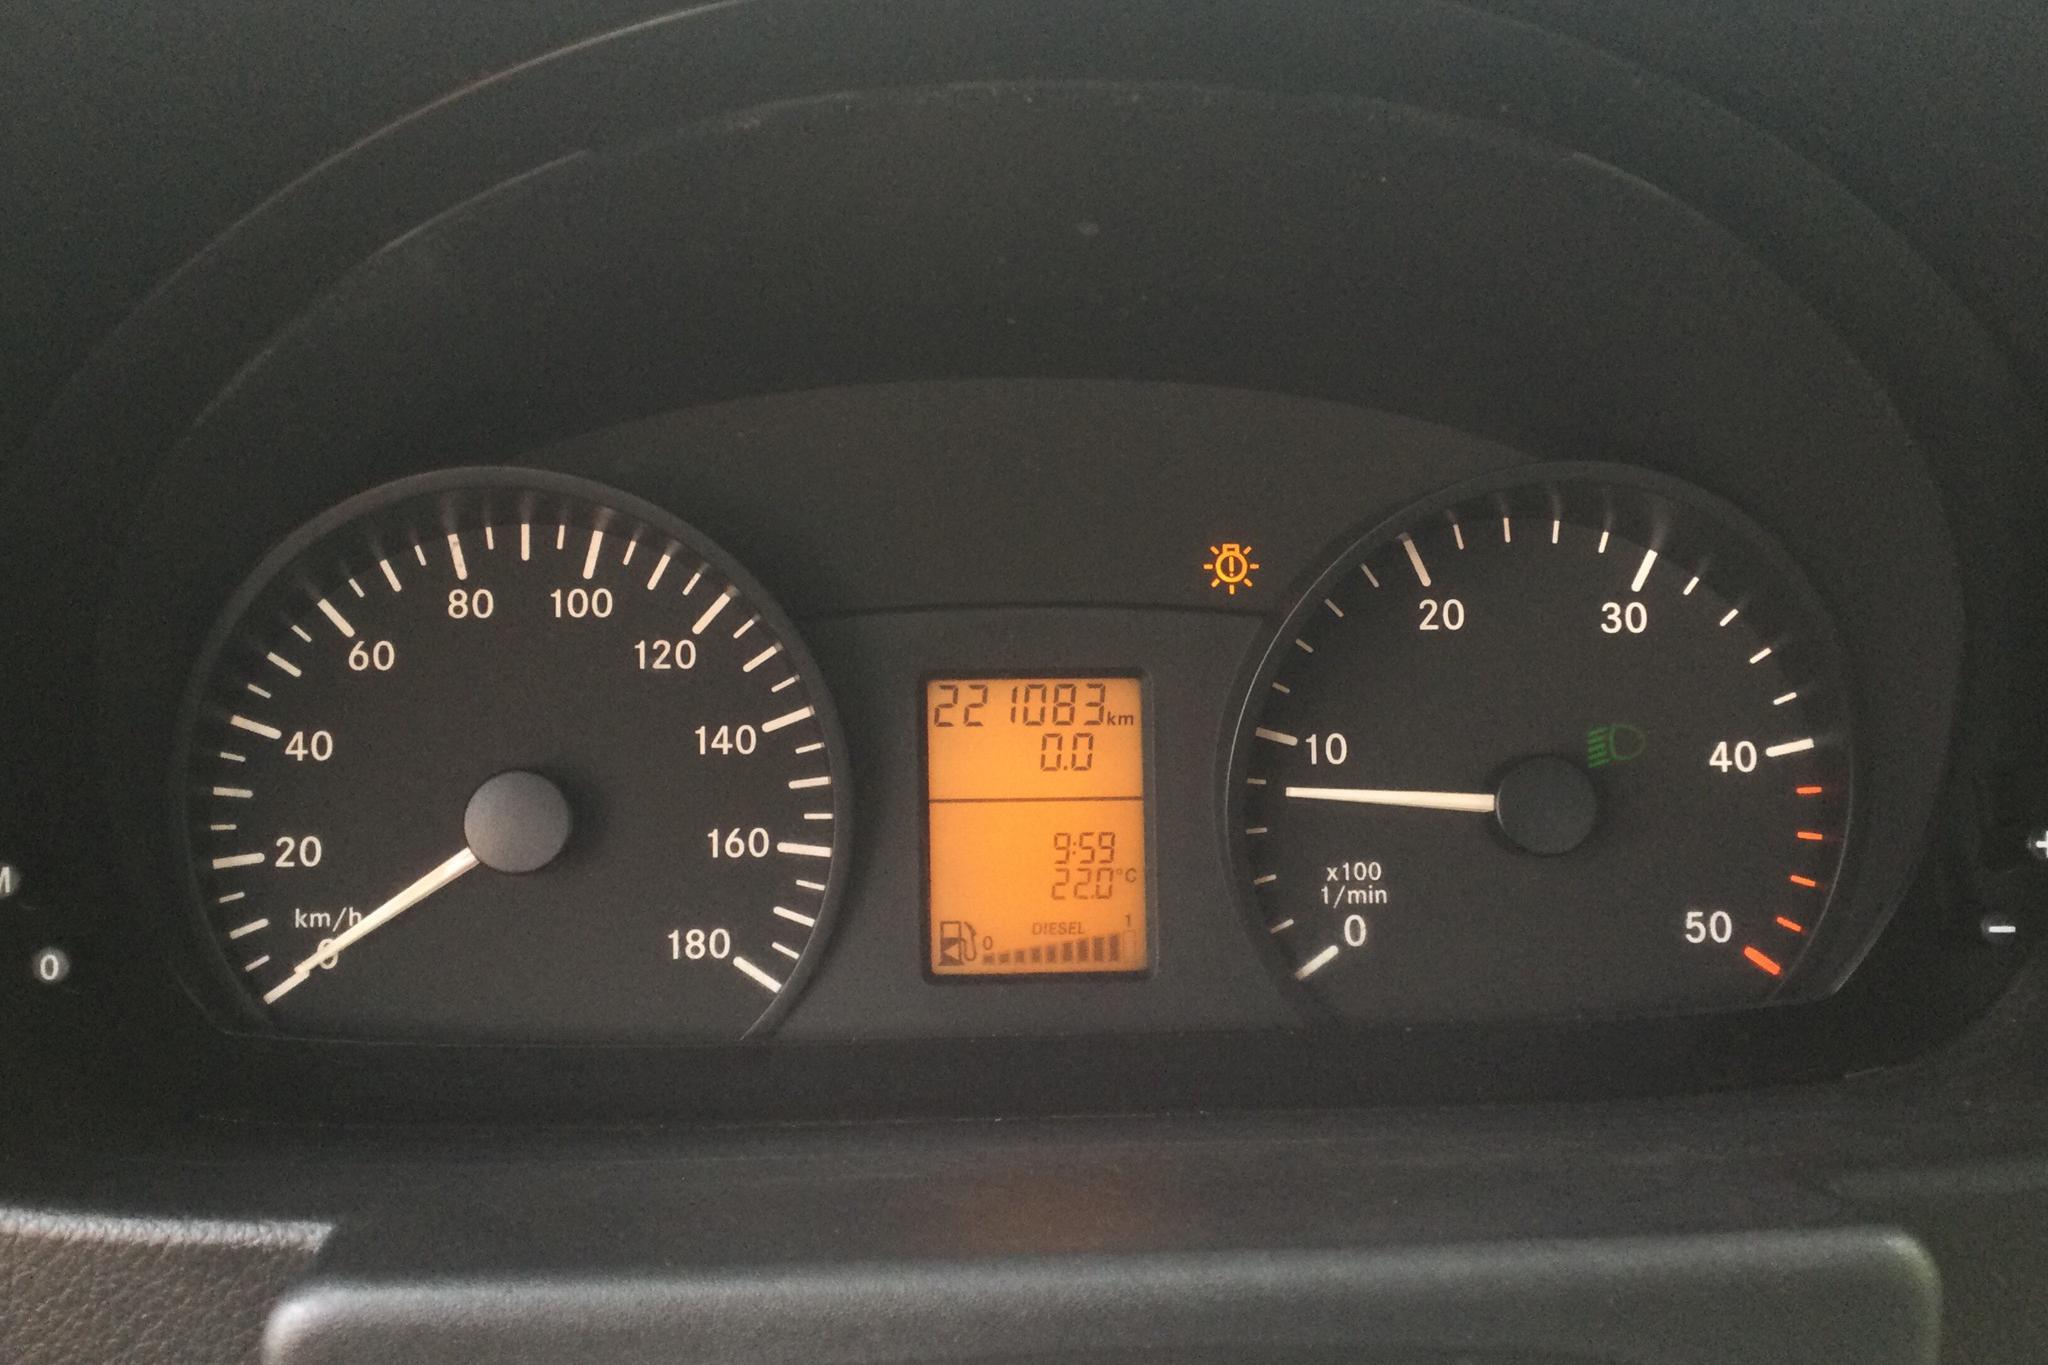 Mercedes Sprinter 316 CDI Pickup/Chassi(163hk) - 22 108 mil - Manuell - vit - 2013